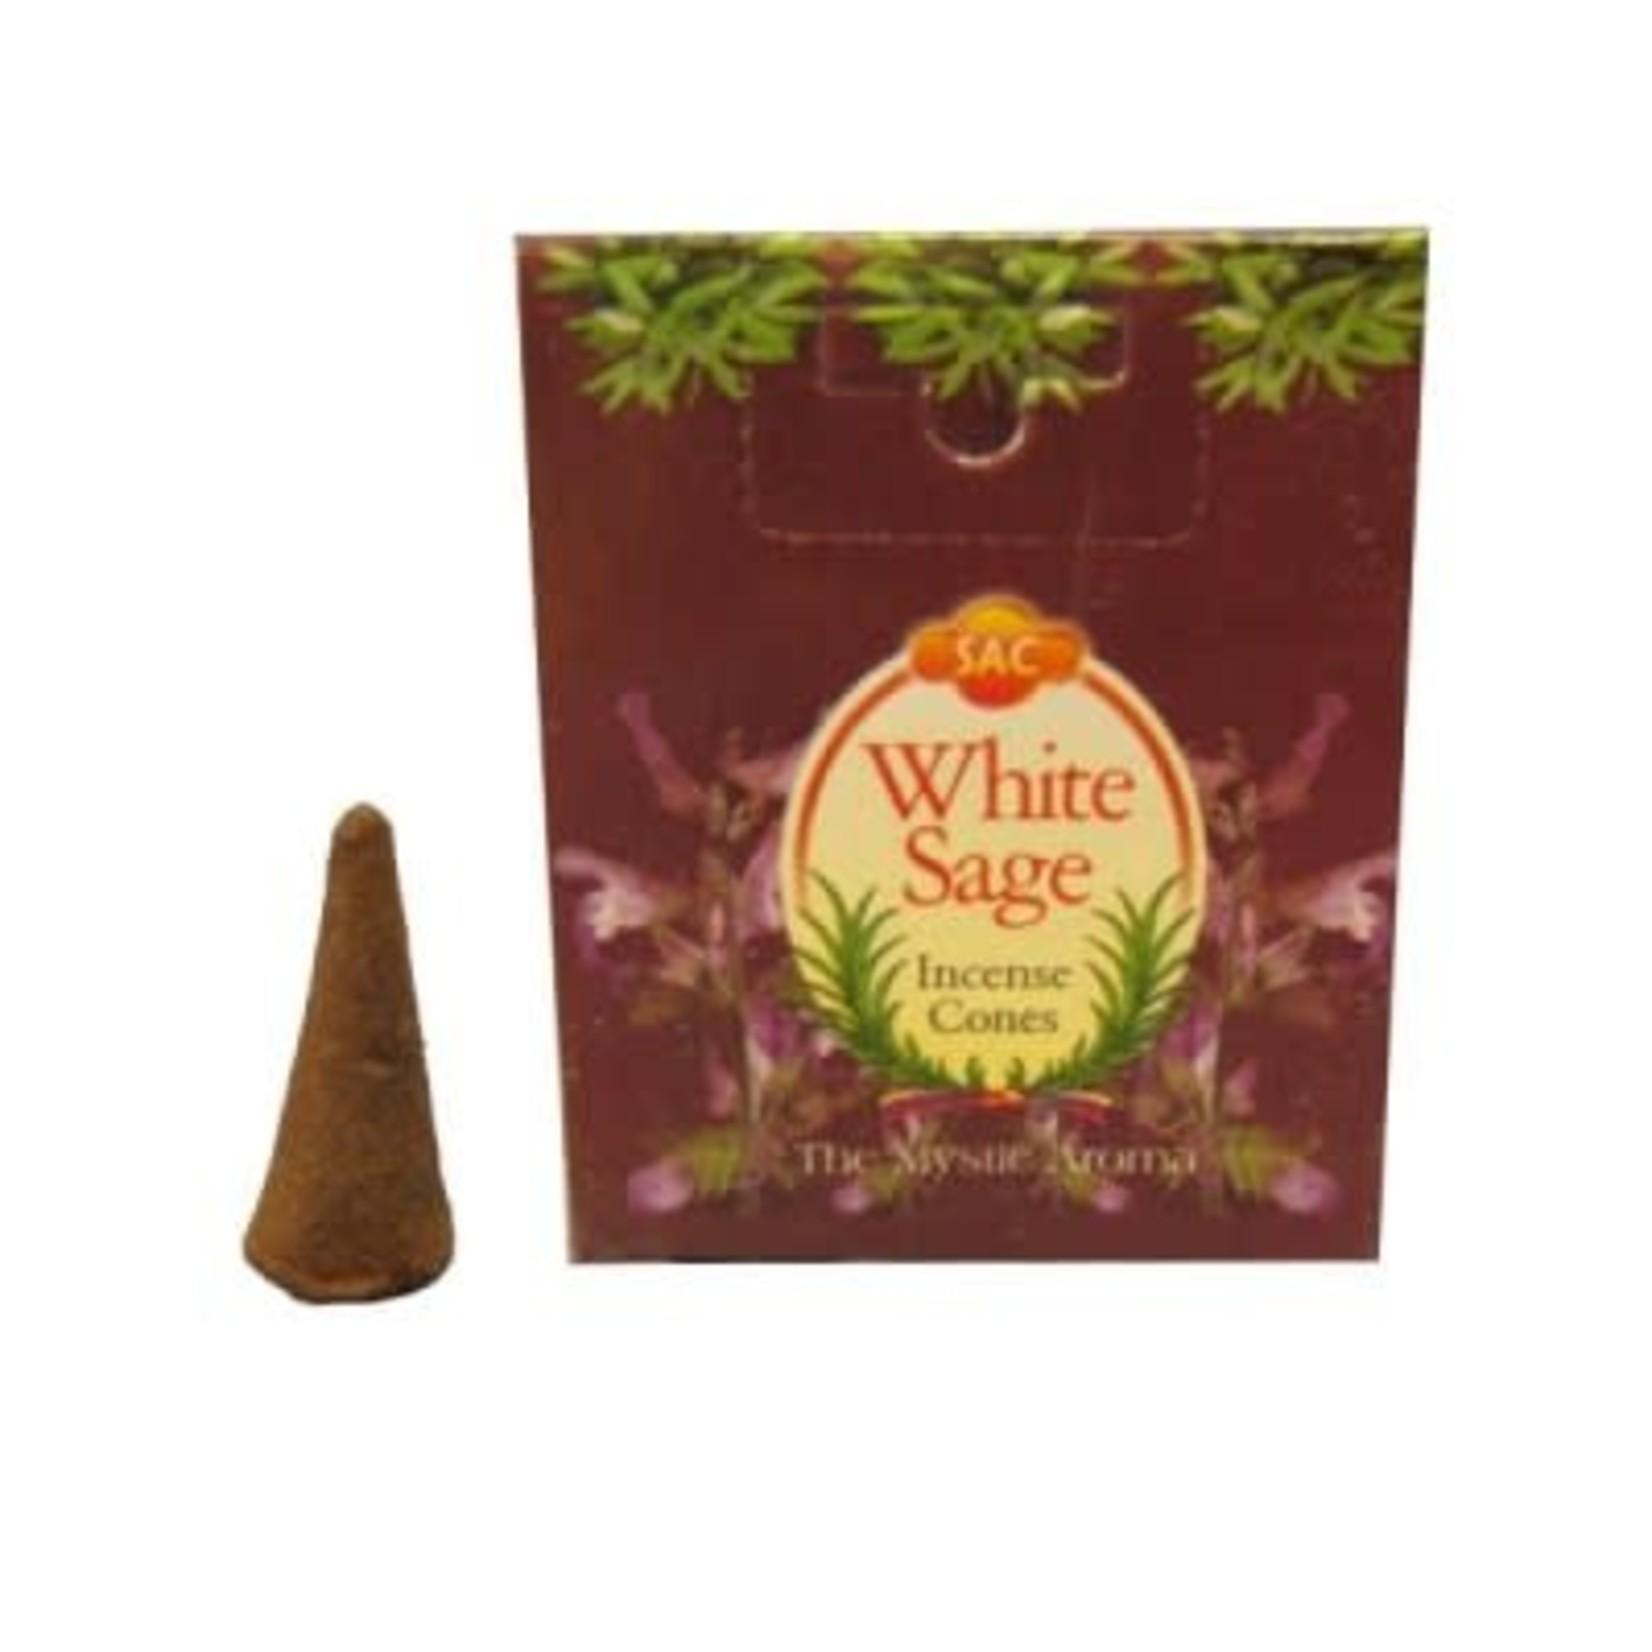 White Sage Incense Cones (SAC)